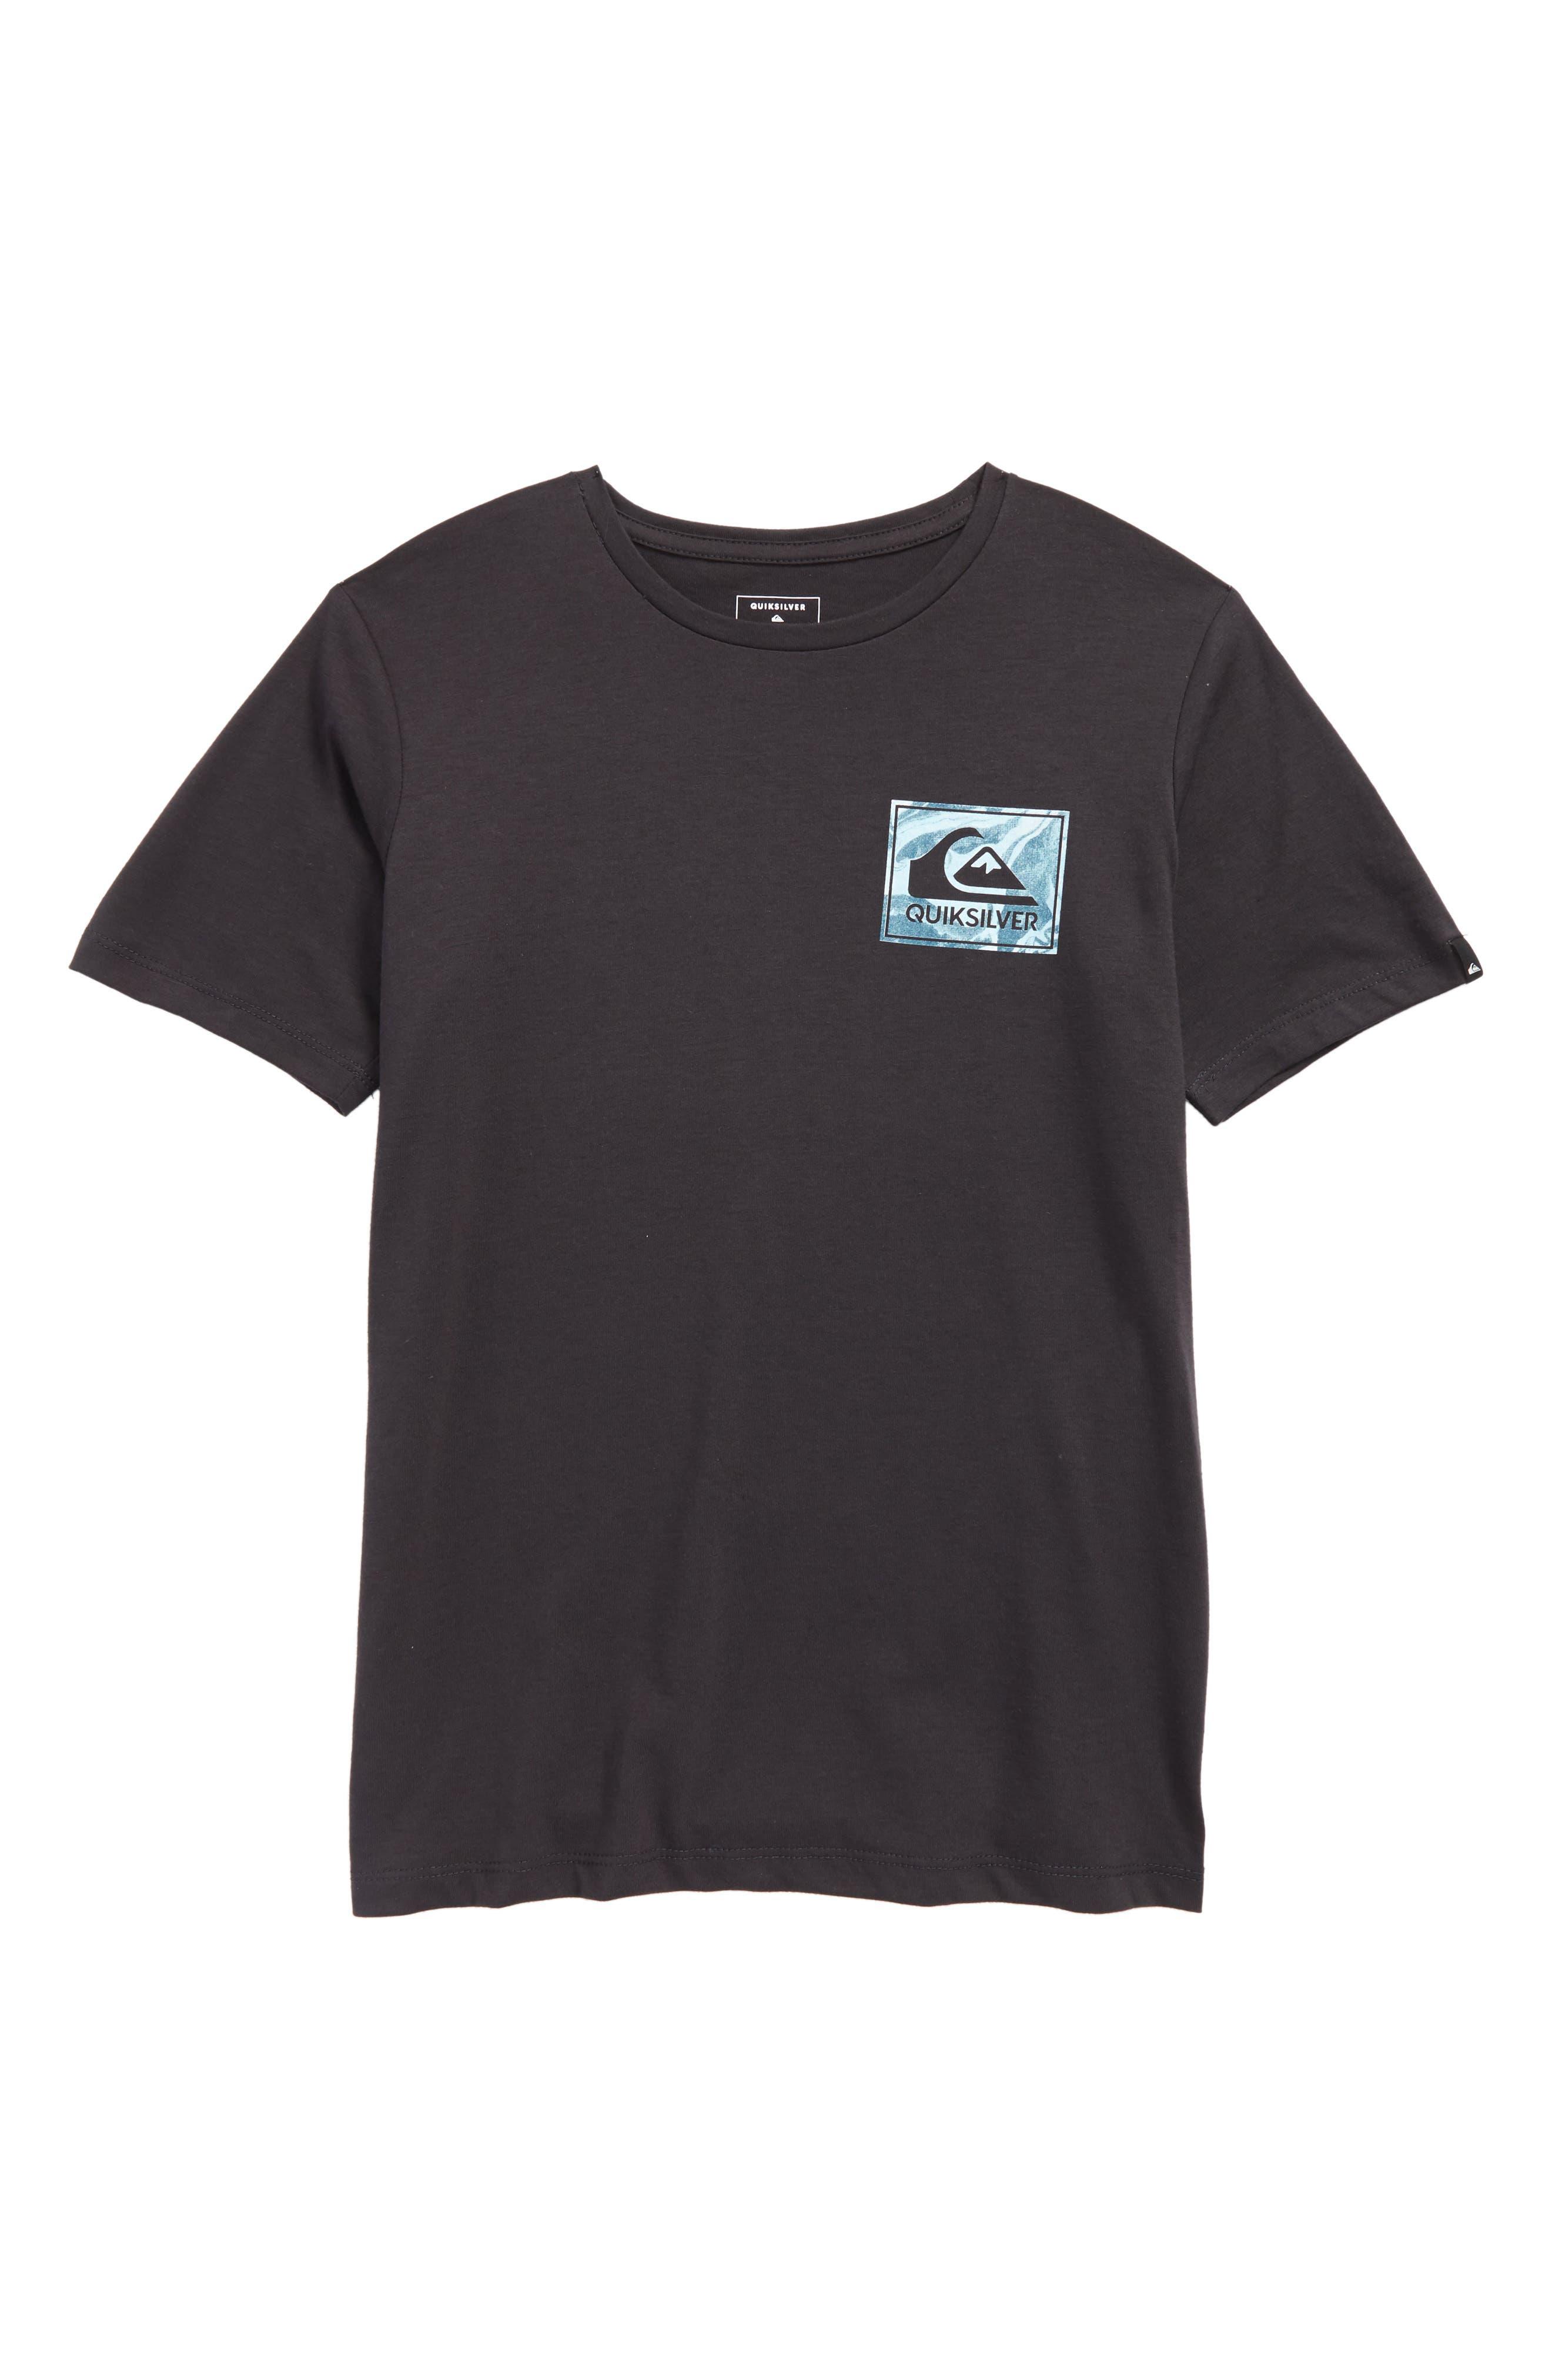 QUIKSILVER Volcano Blues T-Shirt, Main, color, 005